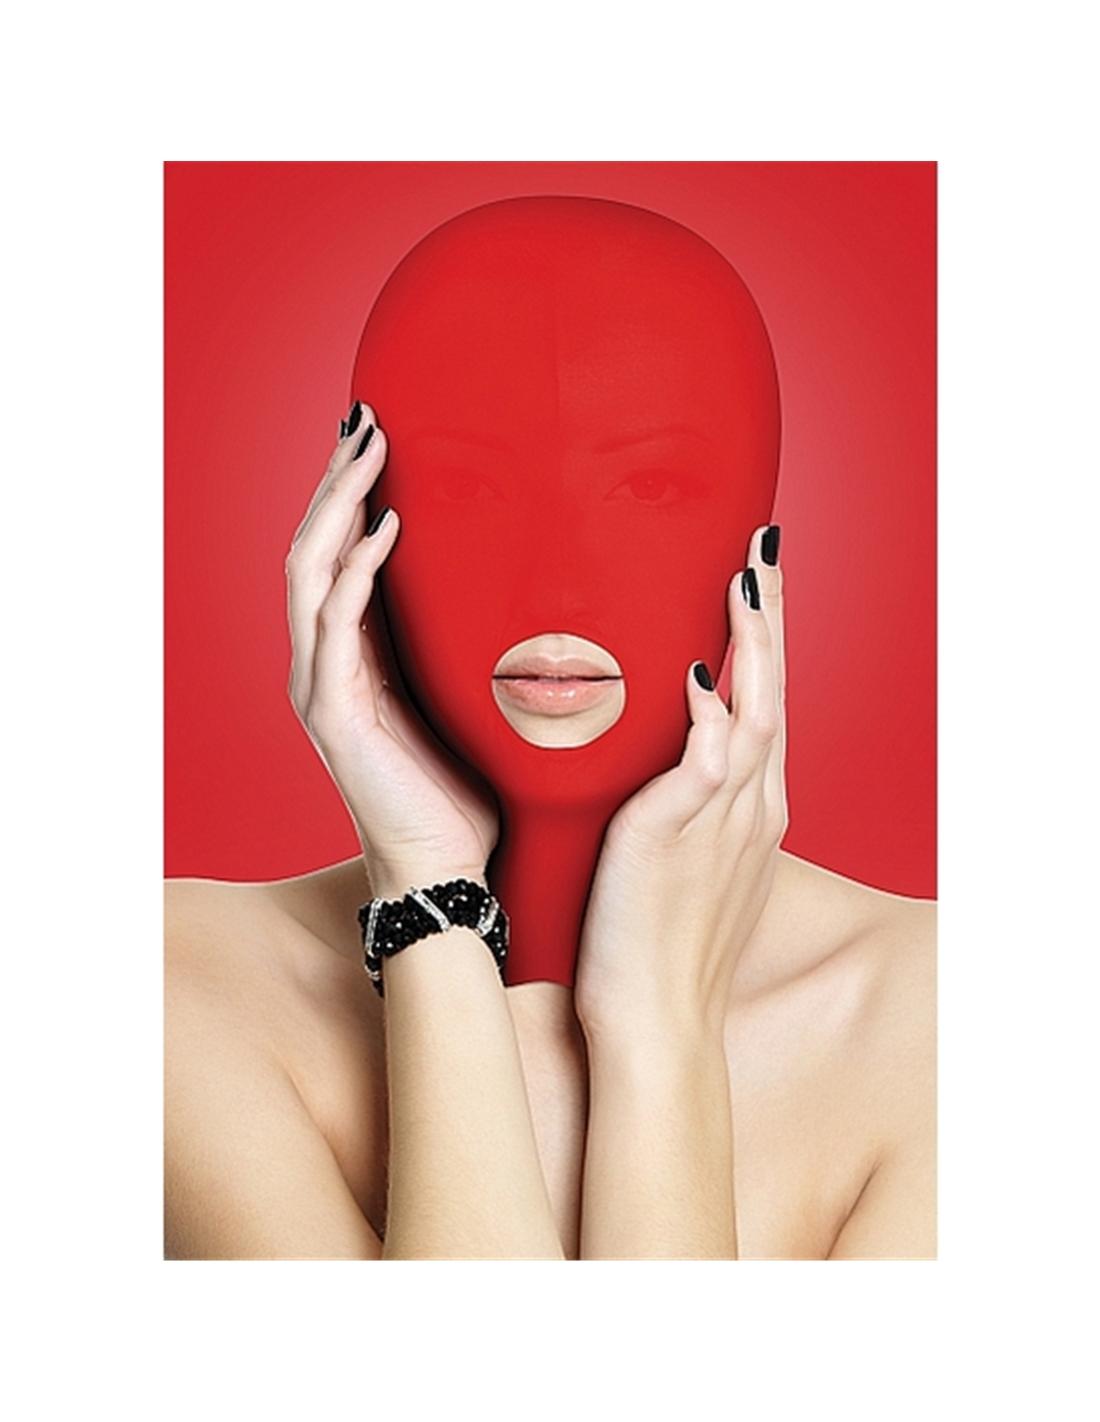 Máscara Submission Mask Vermelha - PR2010320103